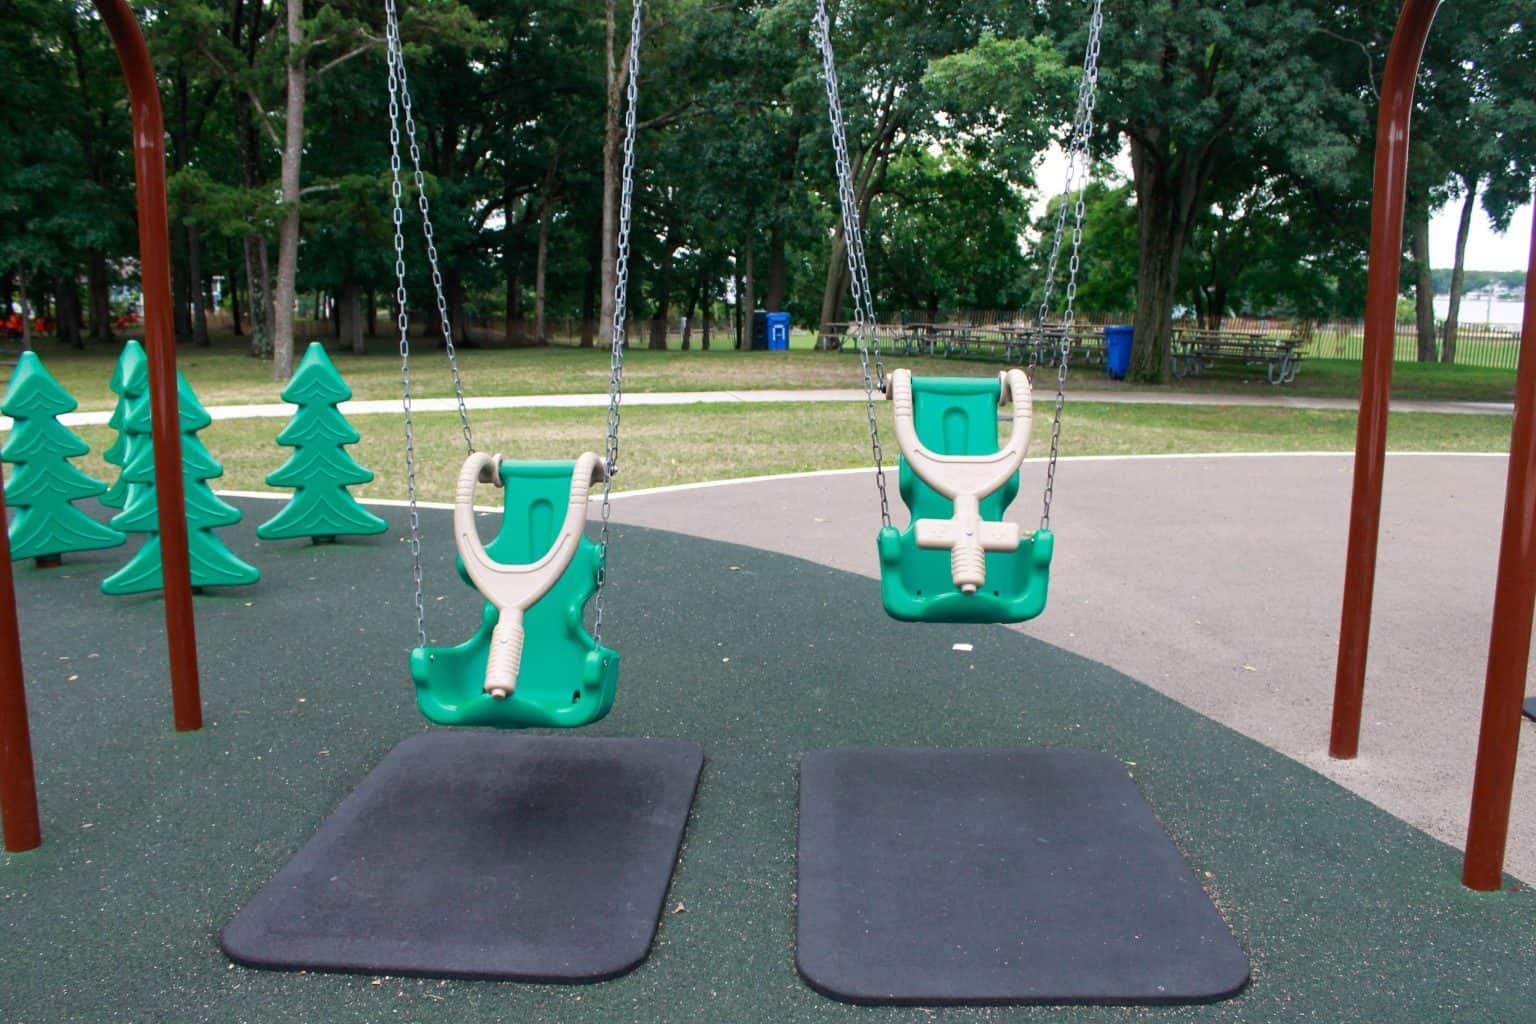 windward-beach-park-playground-brick-nj_27651421393_o-1536x1024